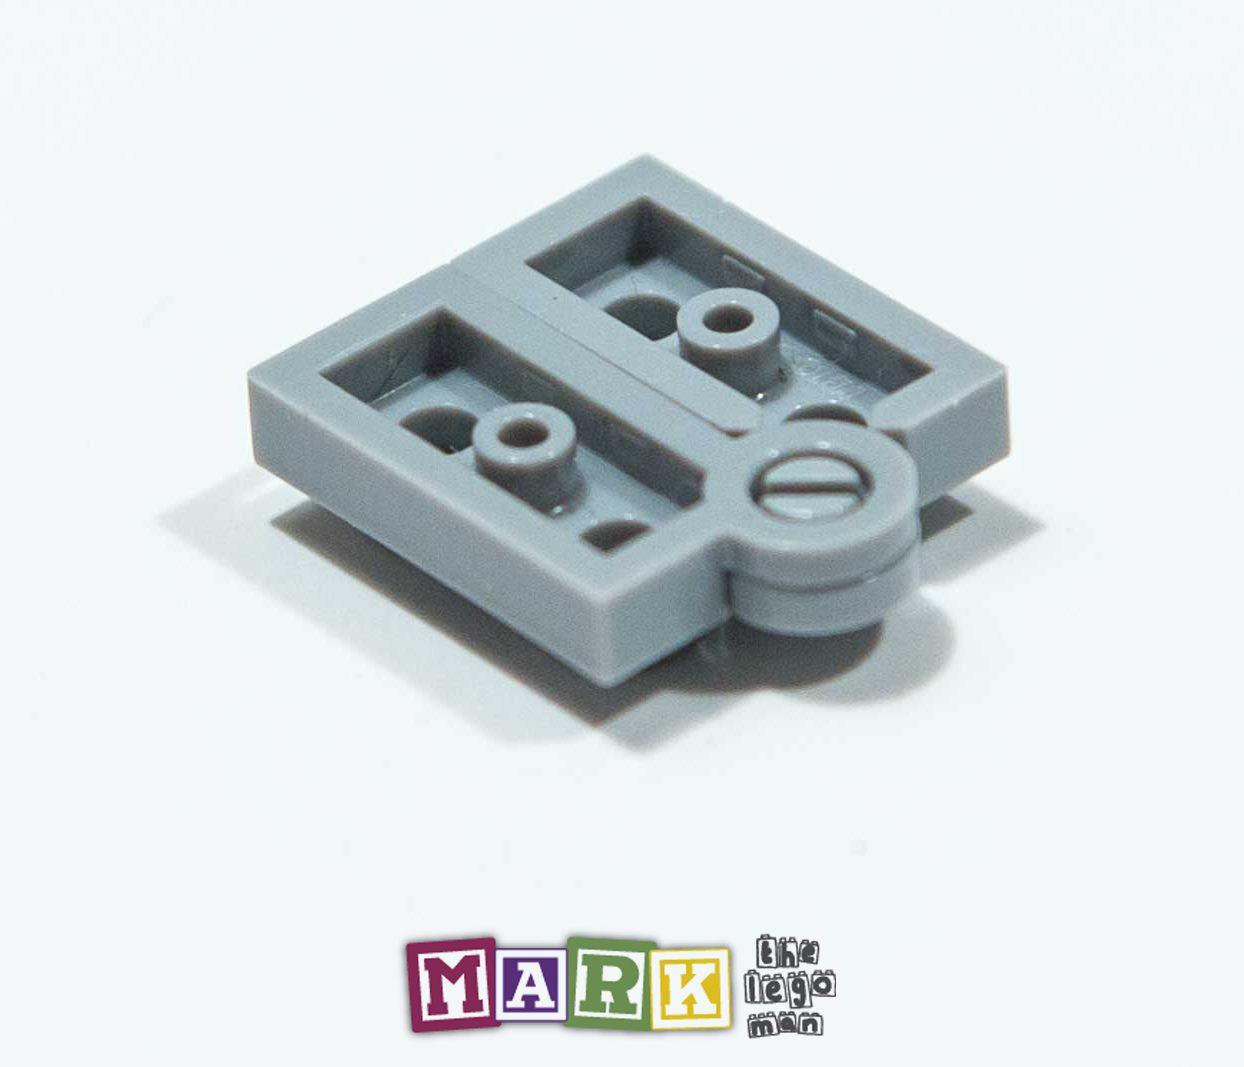 New Lego 19954 1x2 Hinge Plate 6102769